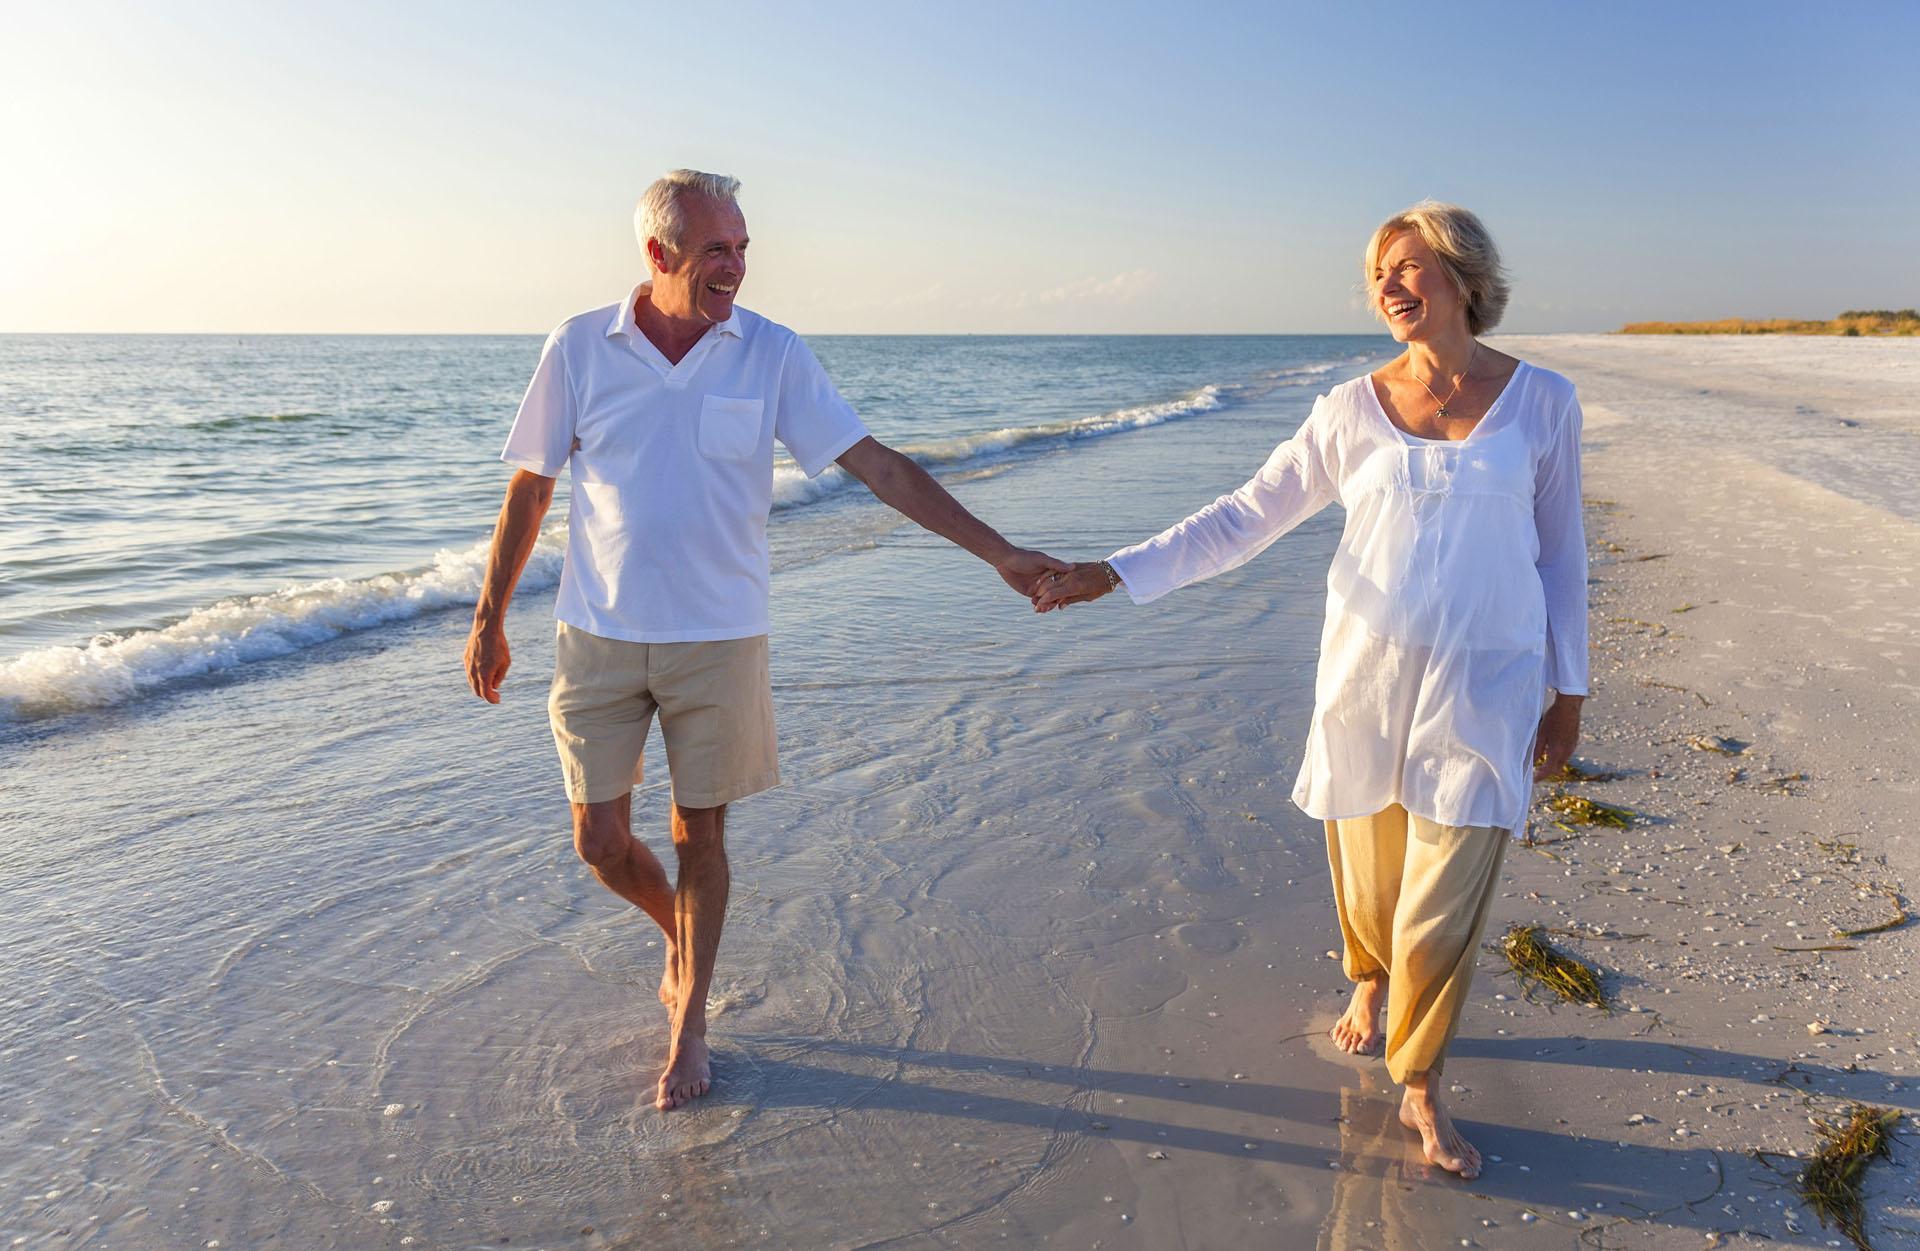 a senior couple in white walking on the beach